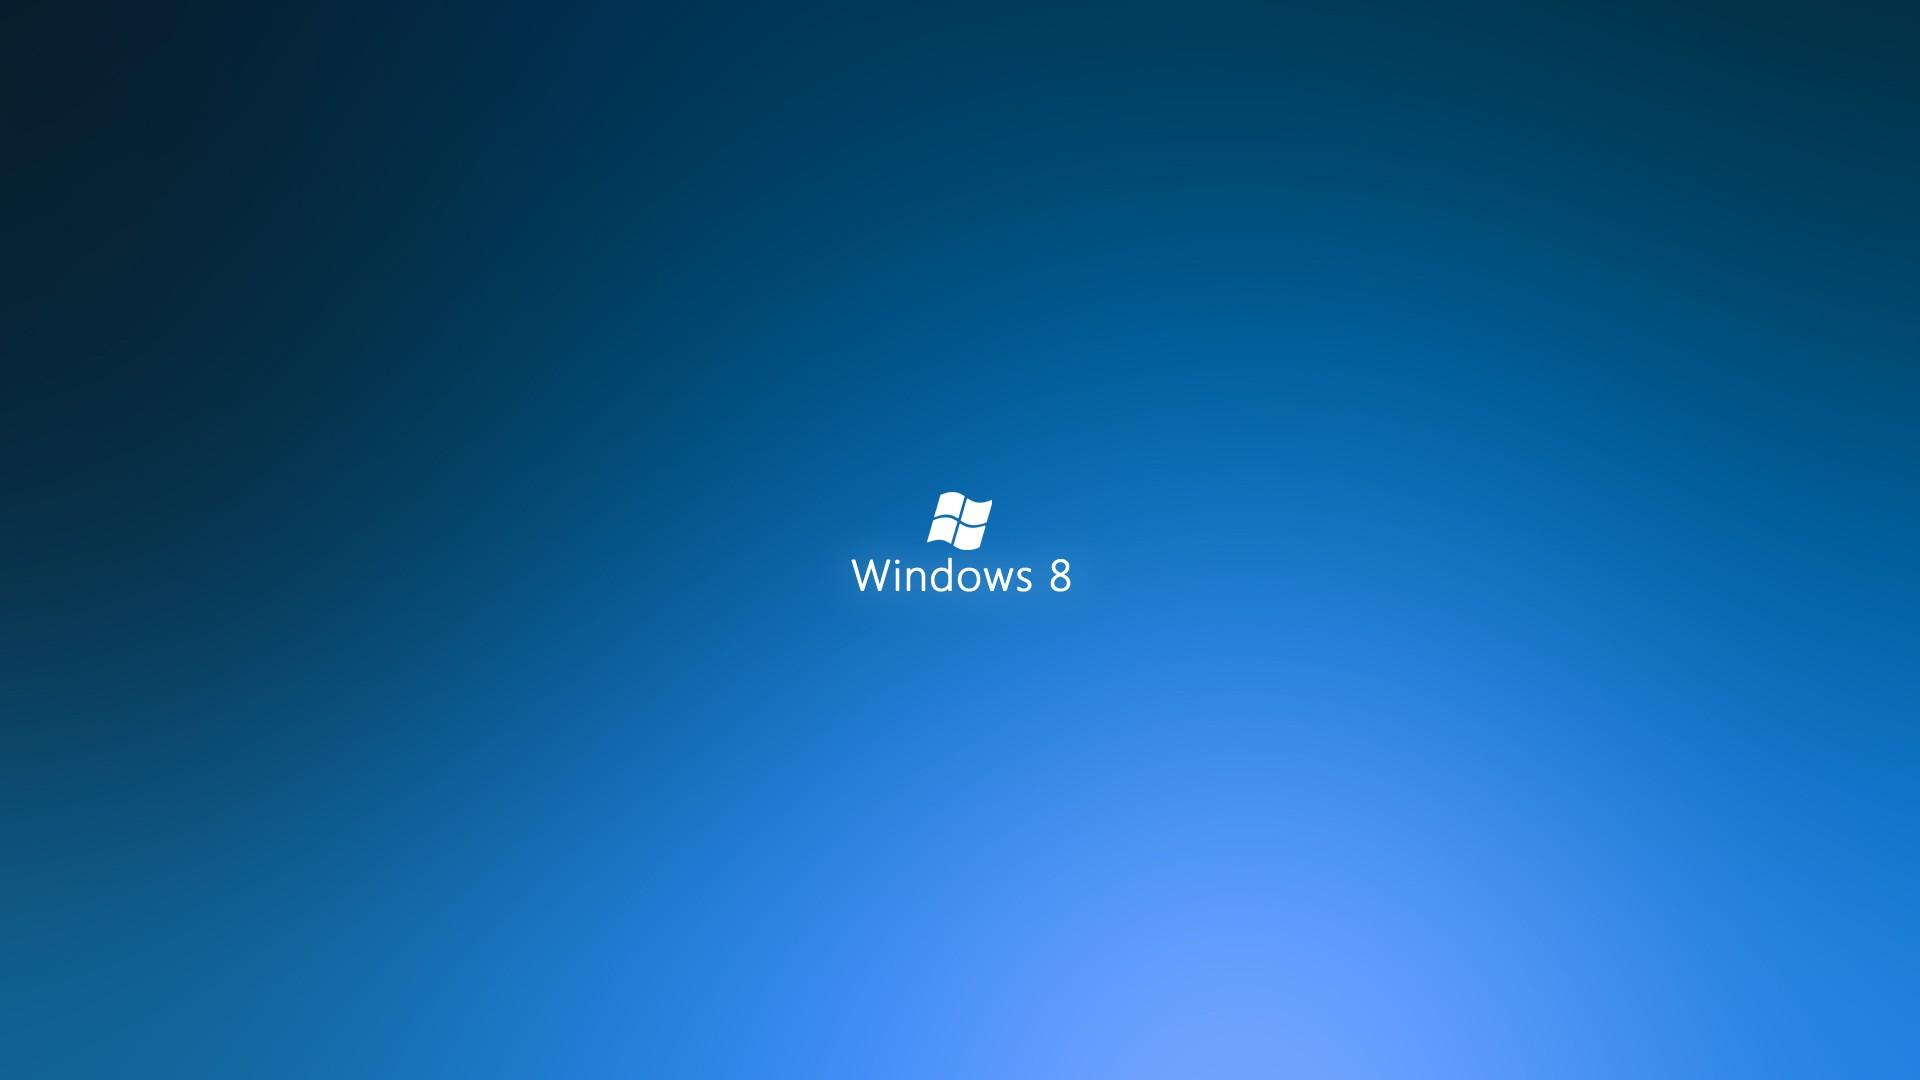 Windows 8 windows 8 wallpapers Windows 8 stunning wallpapers Windows 8 wallpapers Download free Windows 8 wallpapers Download Windows 8 wallpaper 6